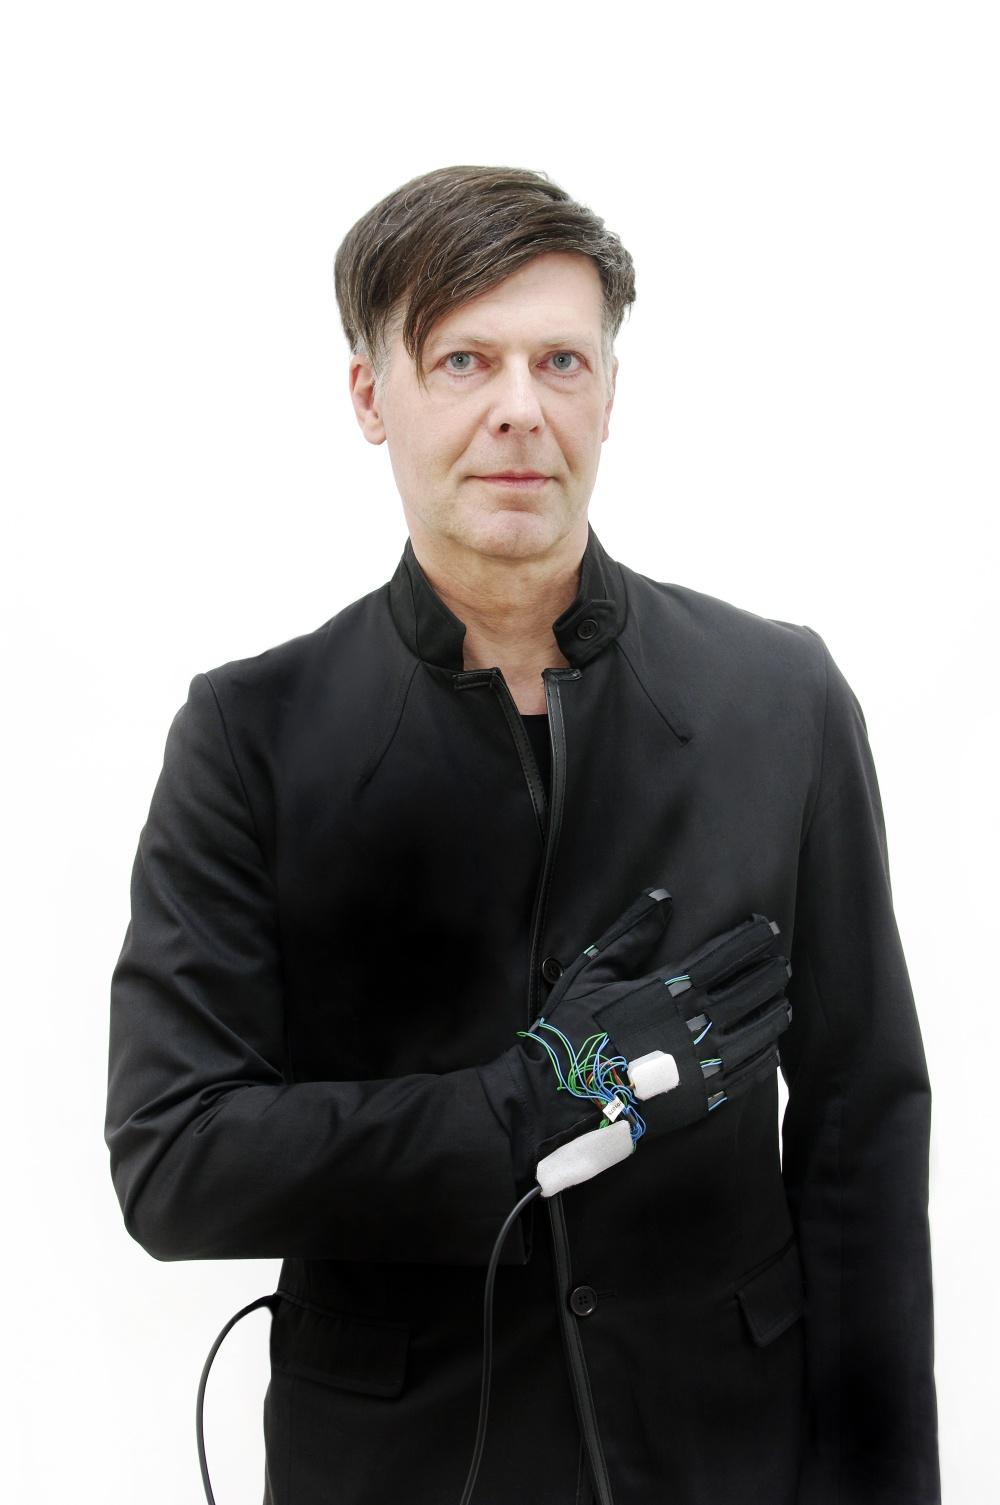 Olaf Schirm Symboter Dataglove